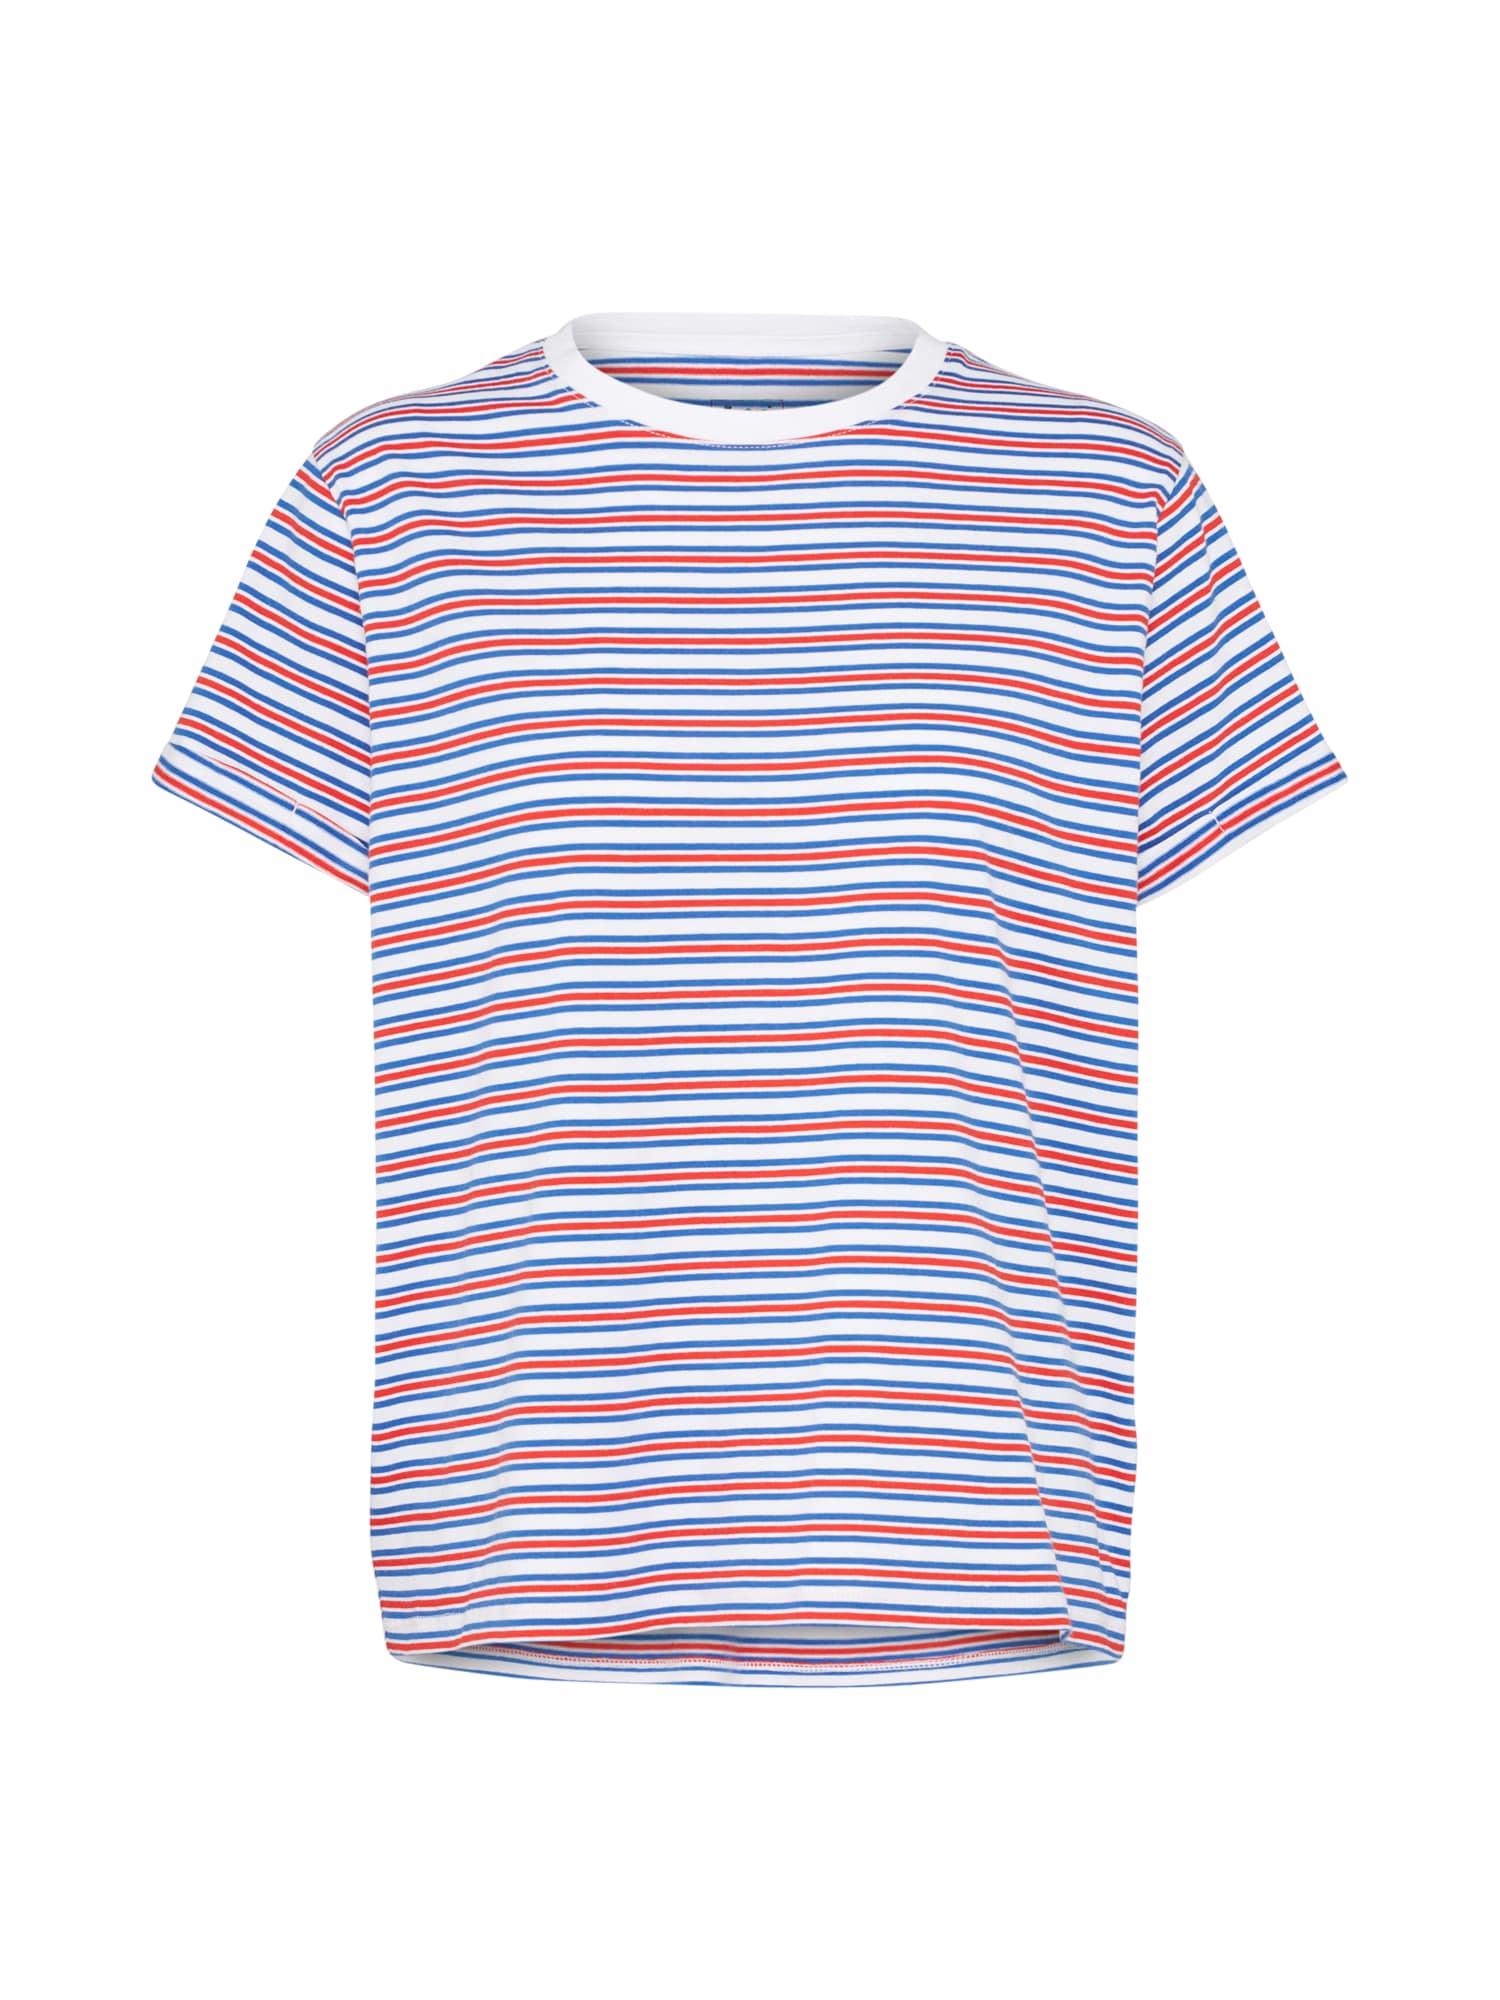 Lee Dames Shirt STRIPE blauw rood wit